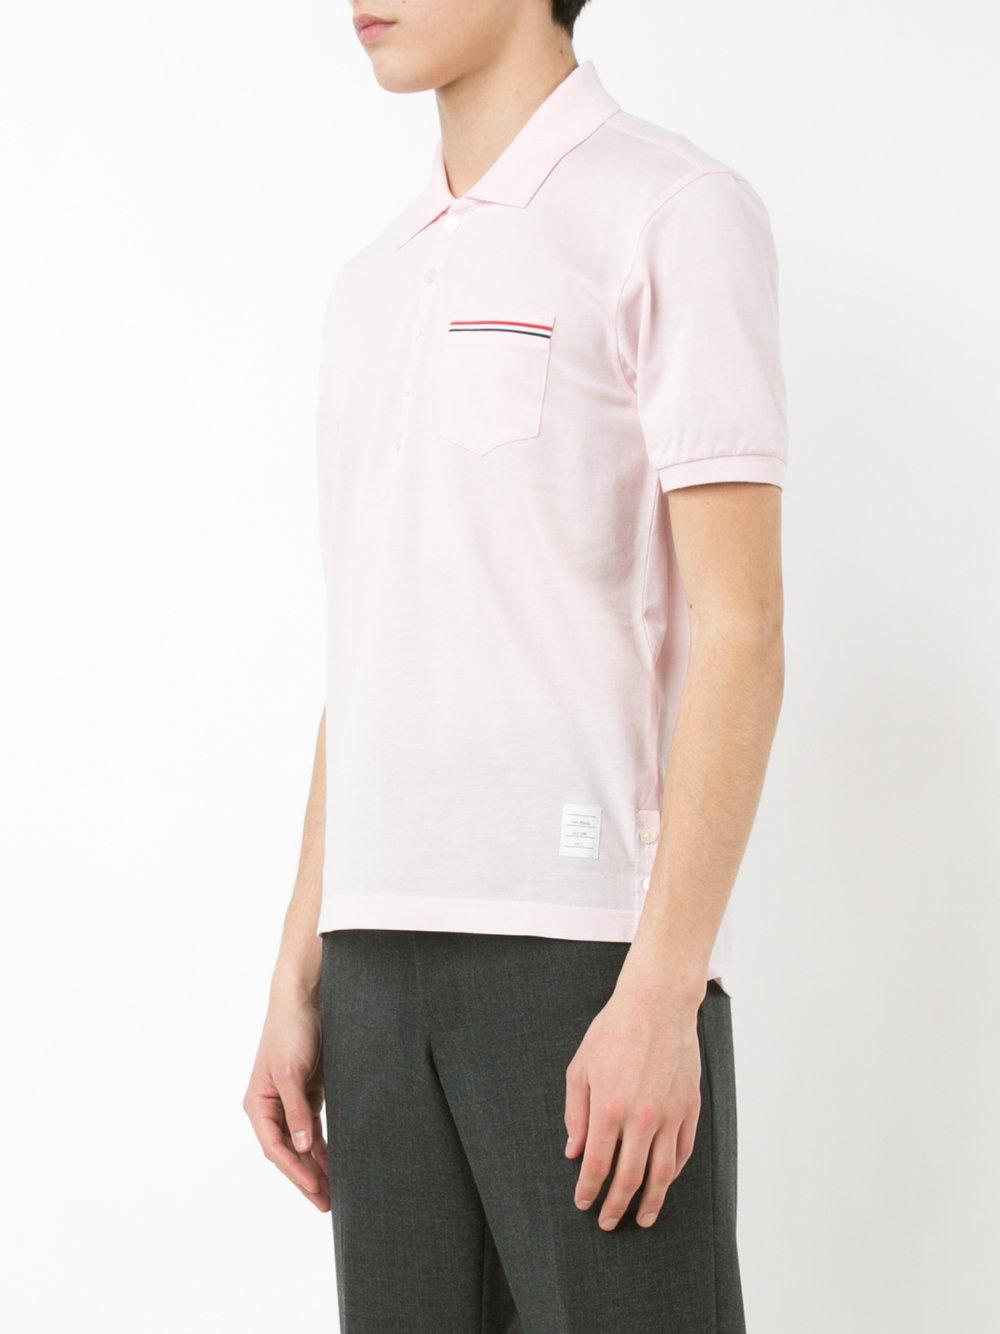 Thom browne chest pocket polo shirt men cotton 4 for Men s polo shirts with chest pocket